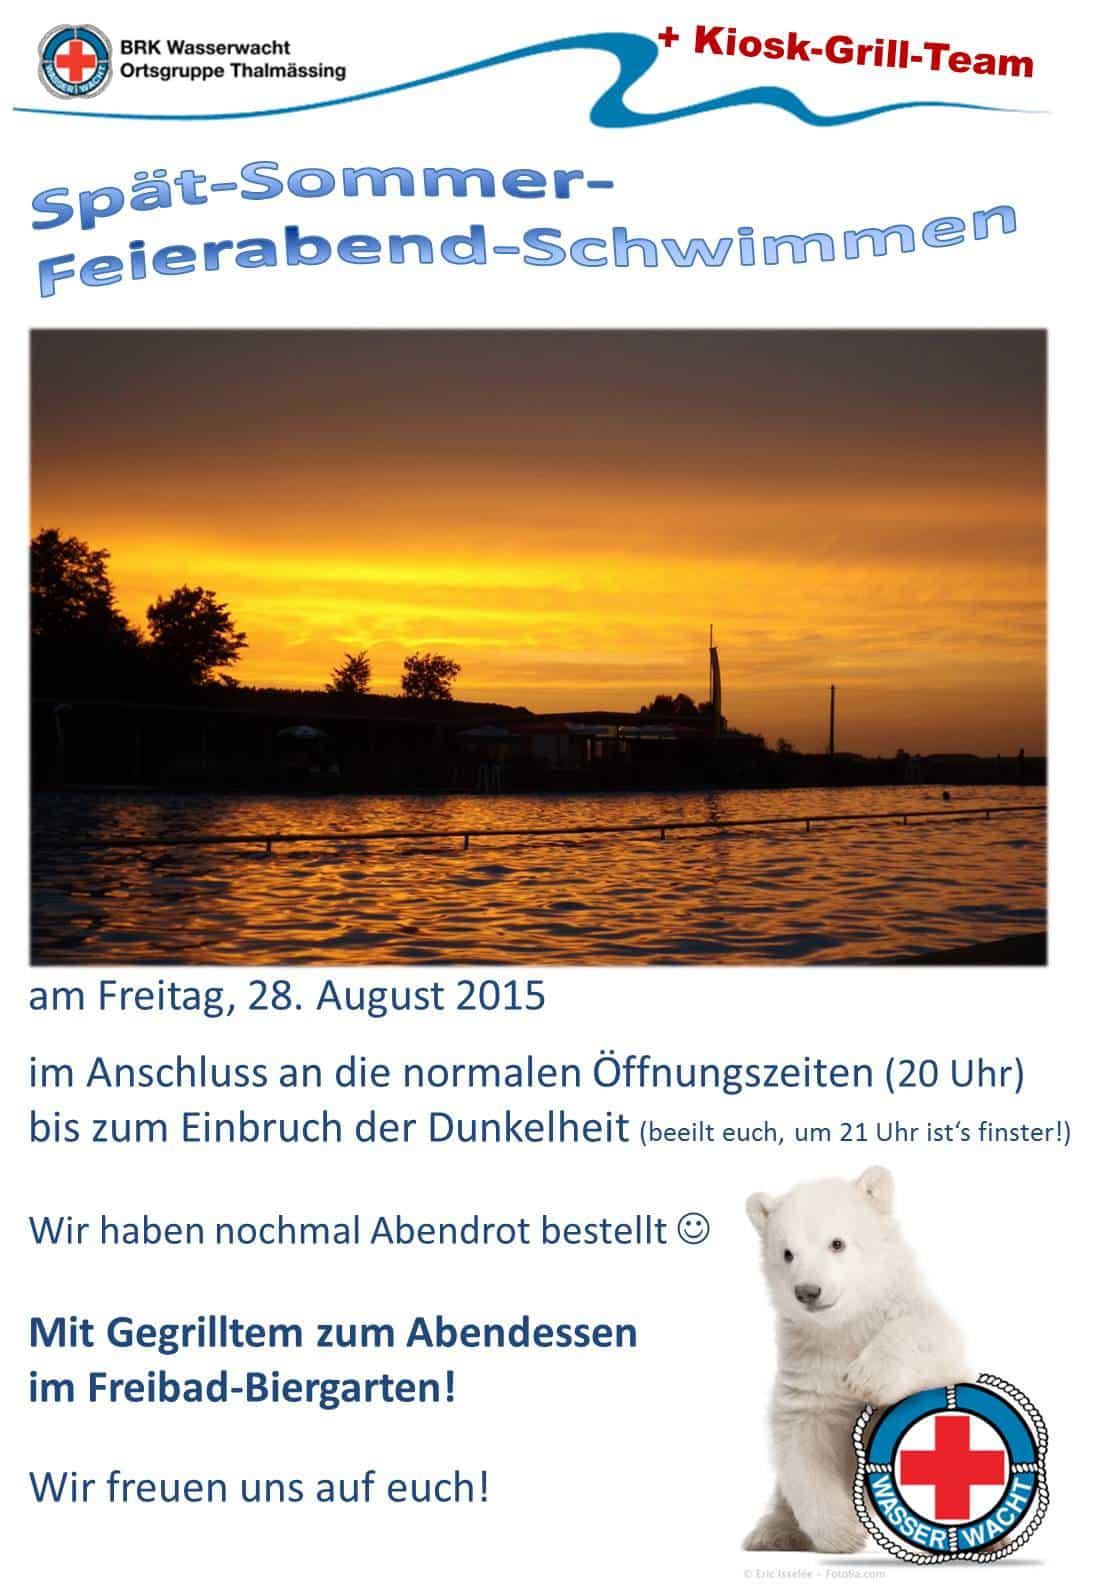 PlakatFeierabendschwimmen20150828